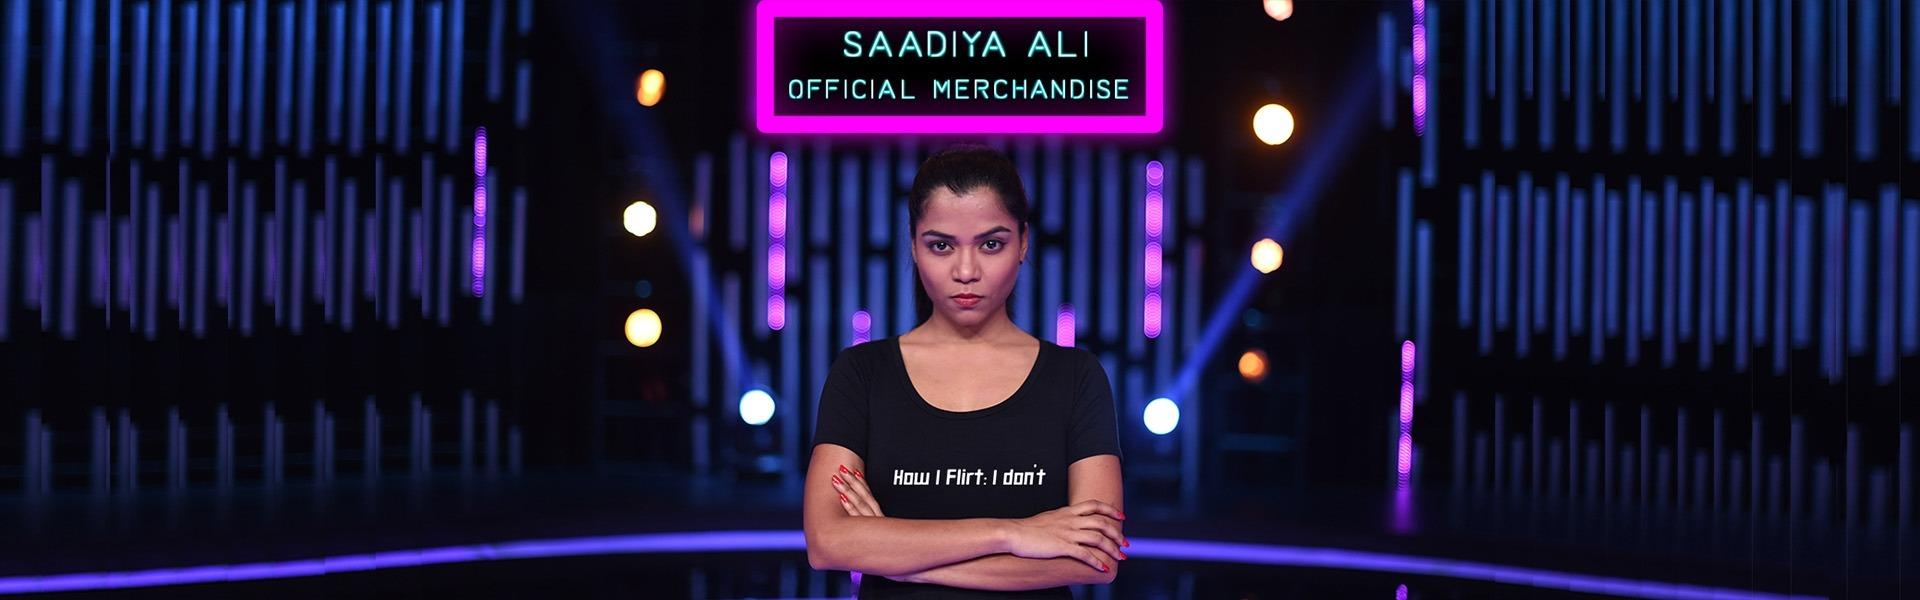 Saadiya Ali